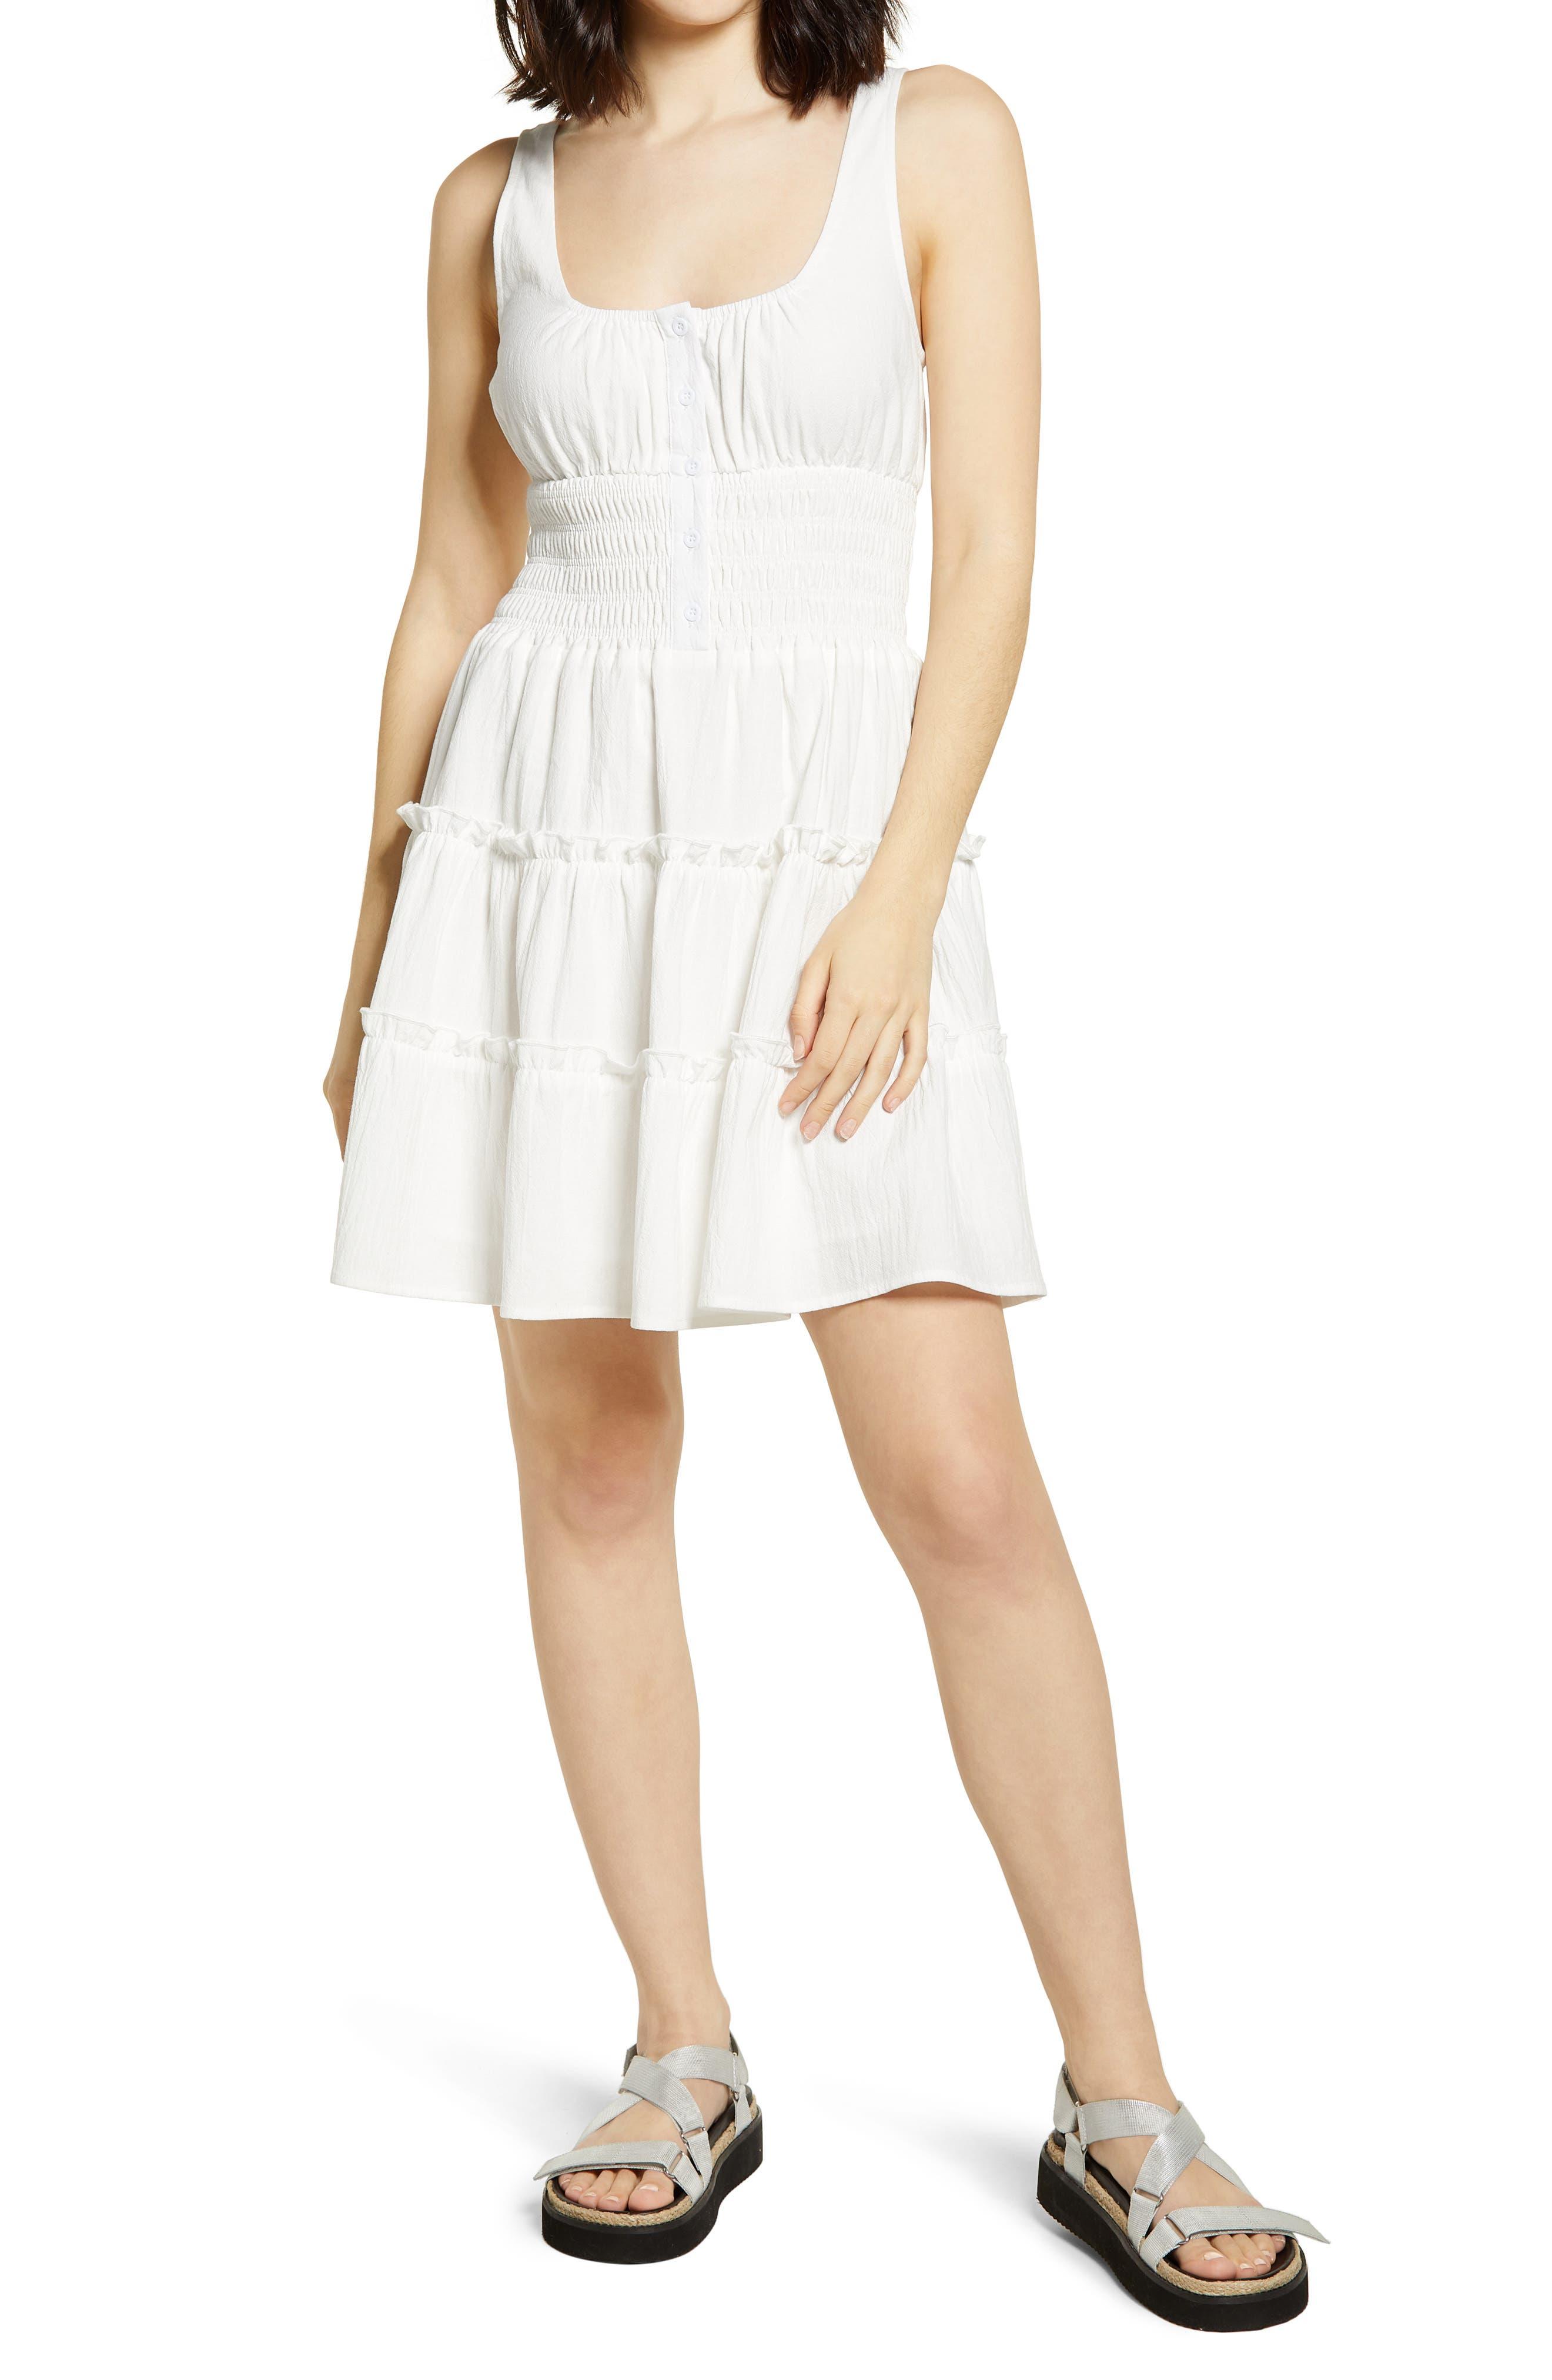 Your Sunny Day Sleeveless Smocked Minidress